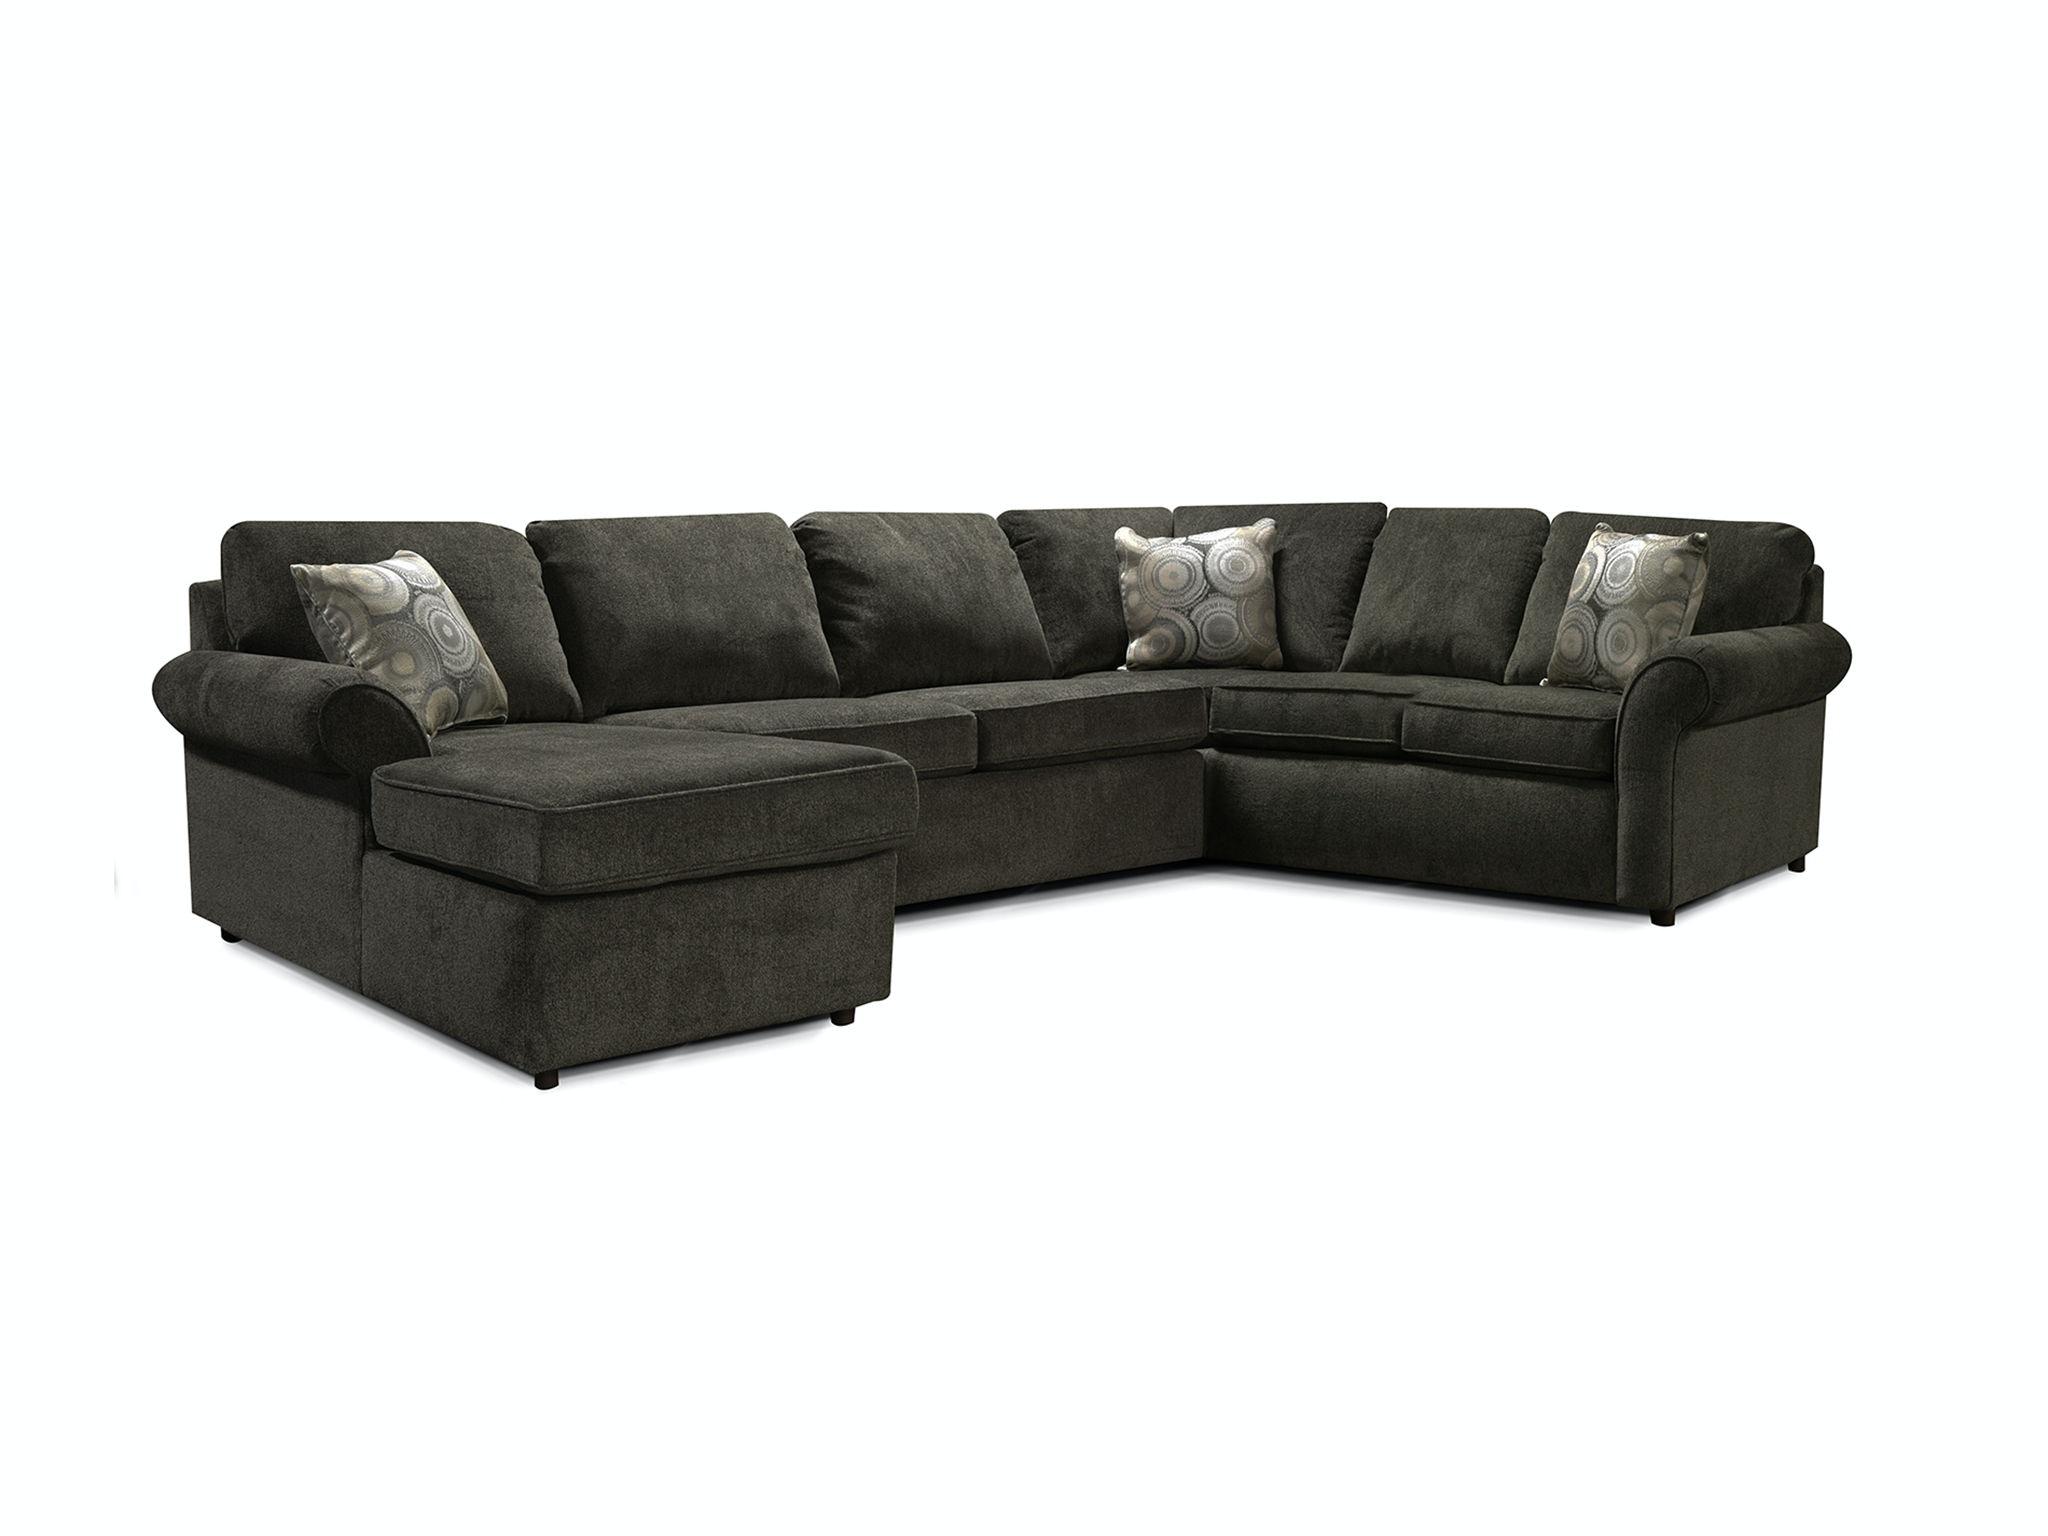 chez long sofa bed tiger print england living room malibu sectional 2400 sect furniture